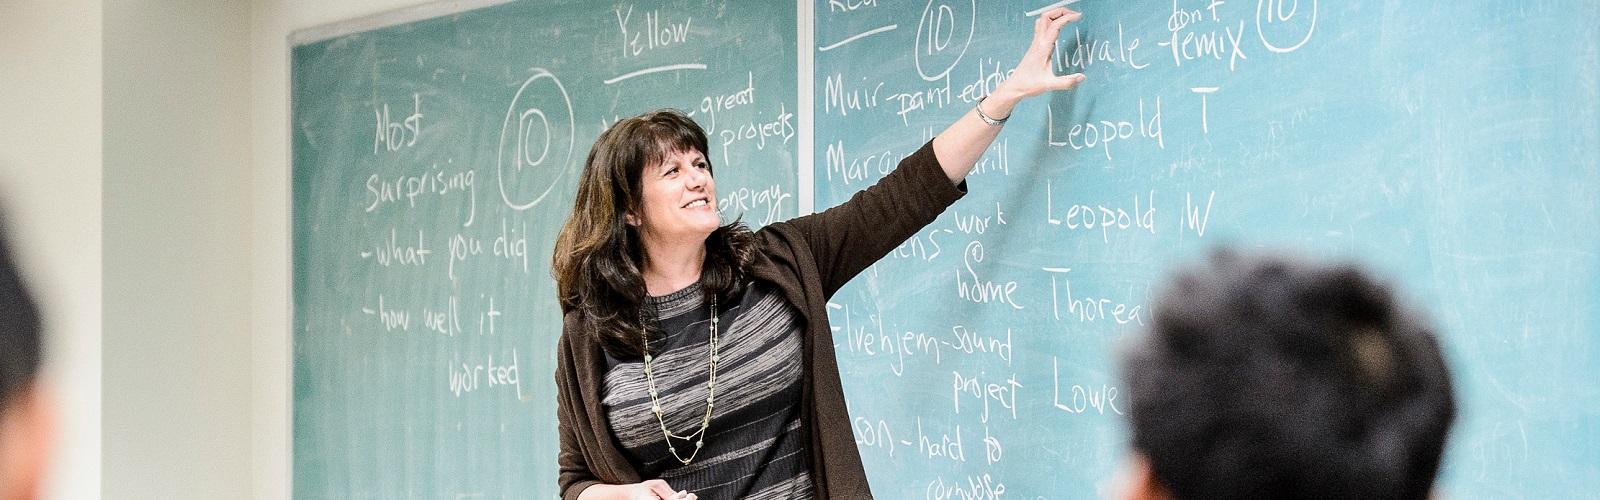 Andrea Arpaci-Dusseau teaching